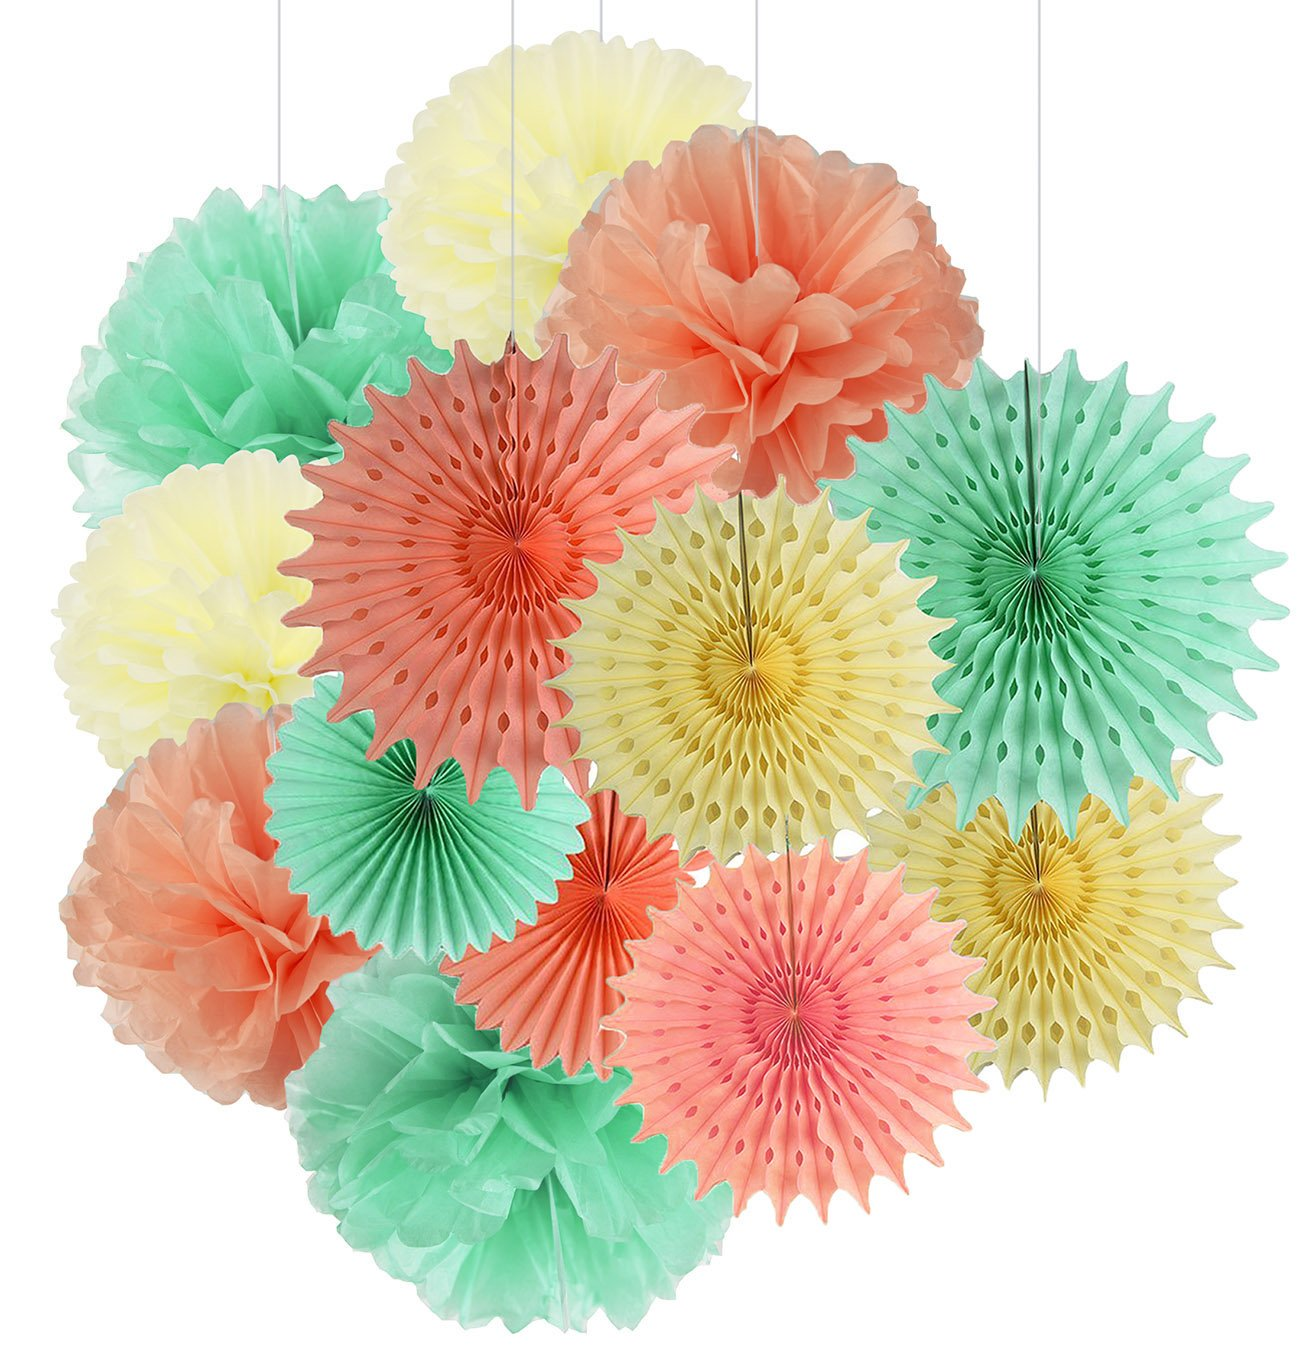 Qians Party 13pcs Mint Peach Cream Tissue Paper Fan Tissue Pom Pom